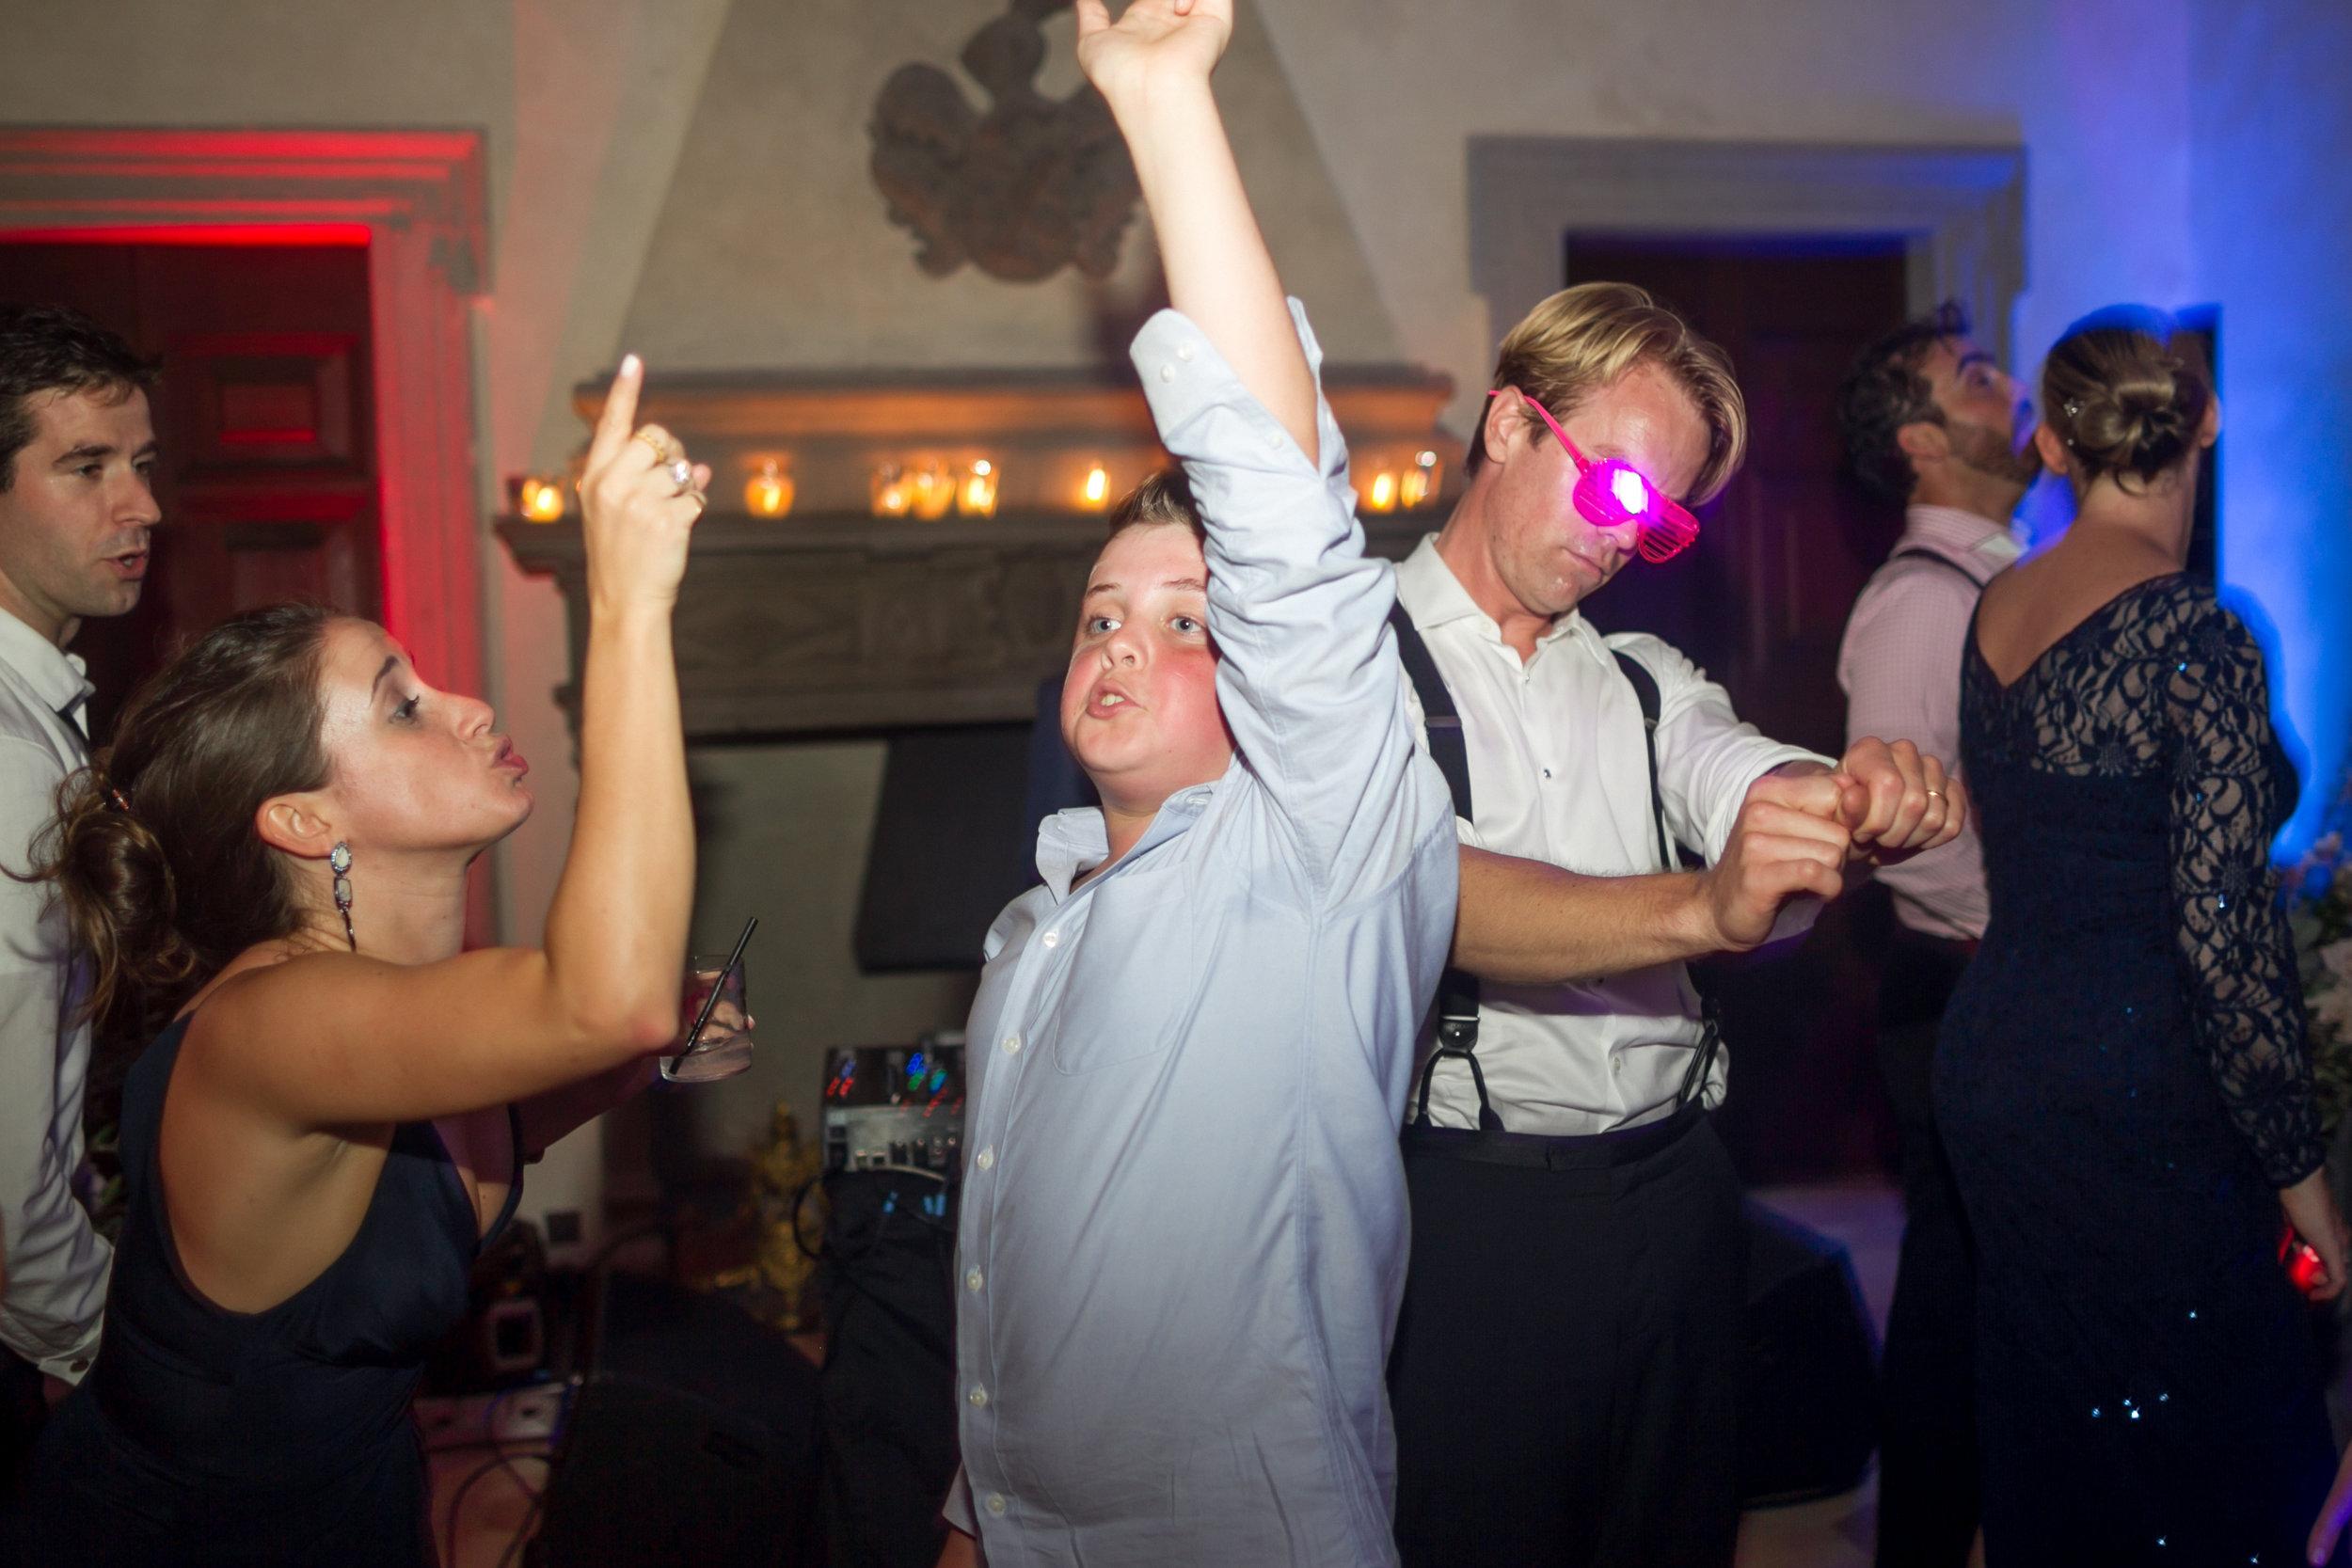 14_late night dancing-1510.jpg